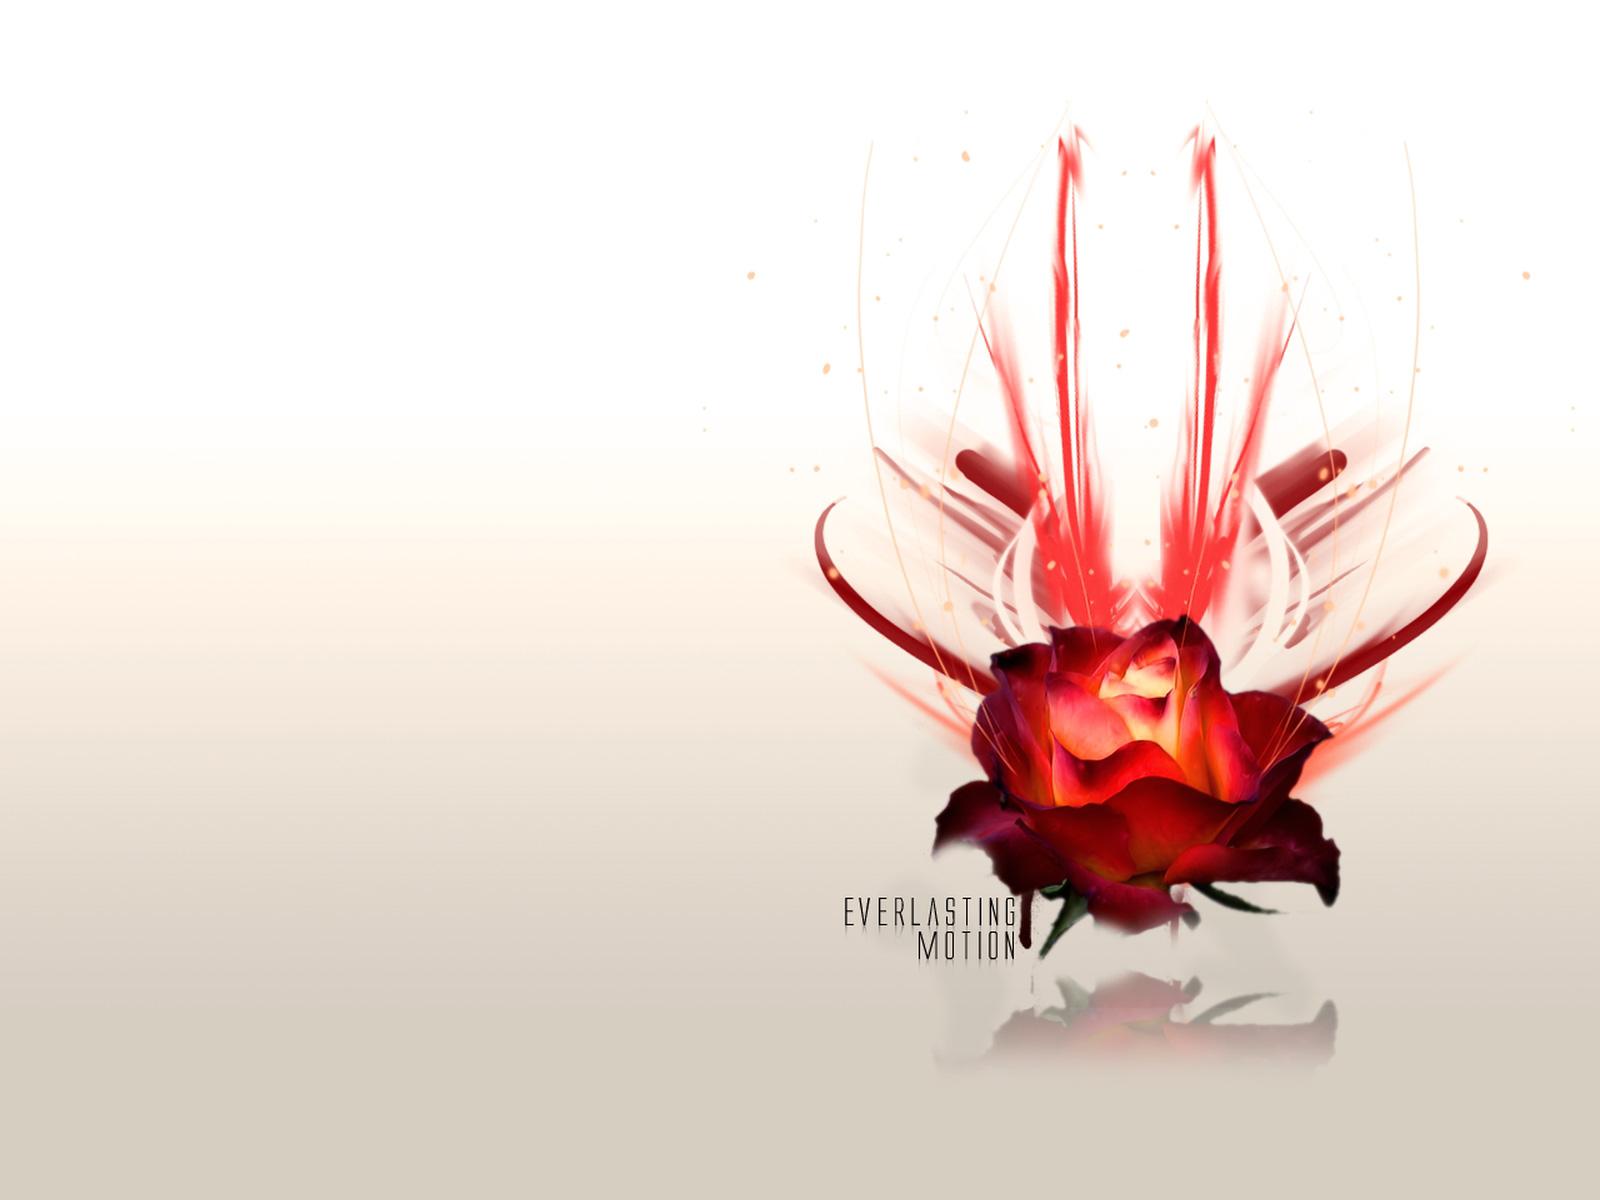 http://1.bp.blogspot.com/_v5h2qxDB1io/TTfrEsX27tI/AAAAAAAABaY/CcDx-7vwnC4/s1600/Valentine%2527s+Day+%25283%2529.jpg